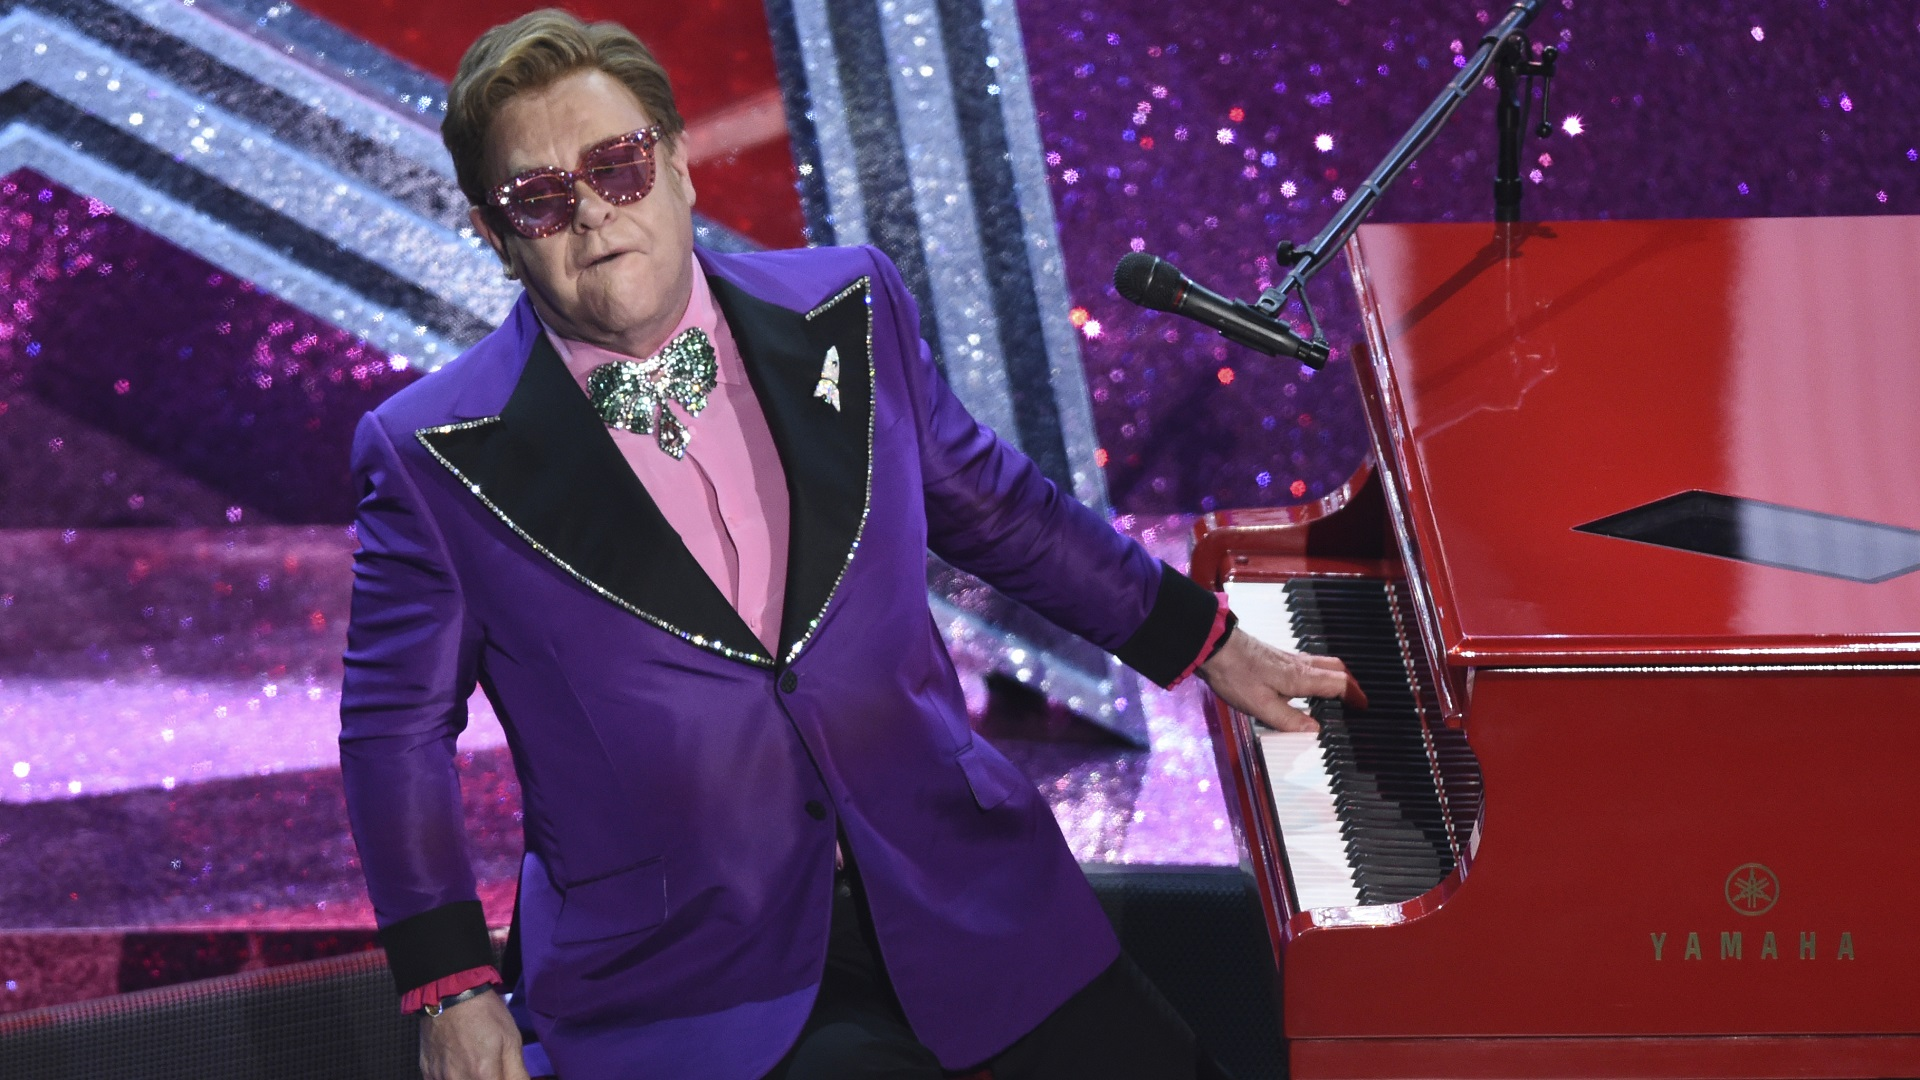 It's Elton John's birthday and he's got rare music for fans